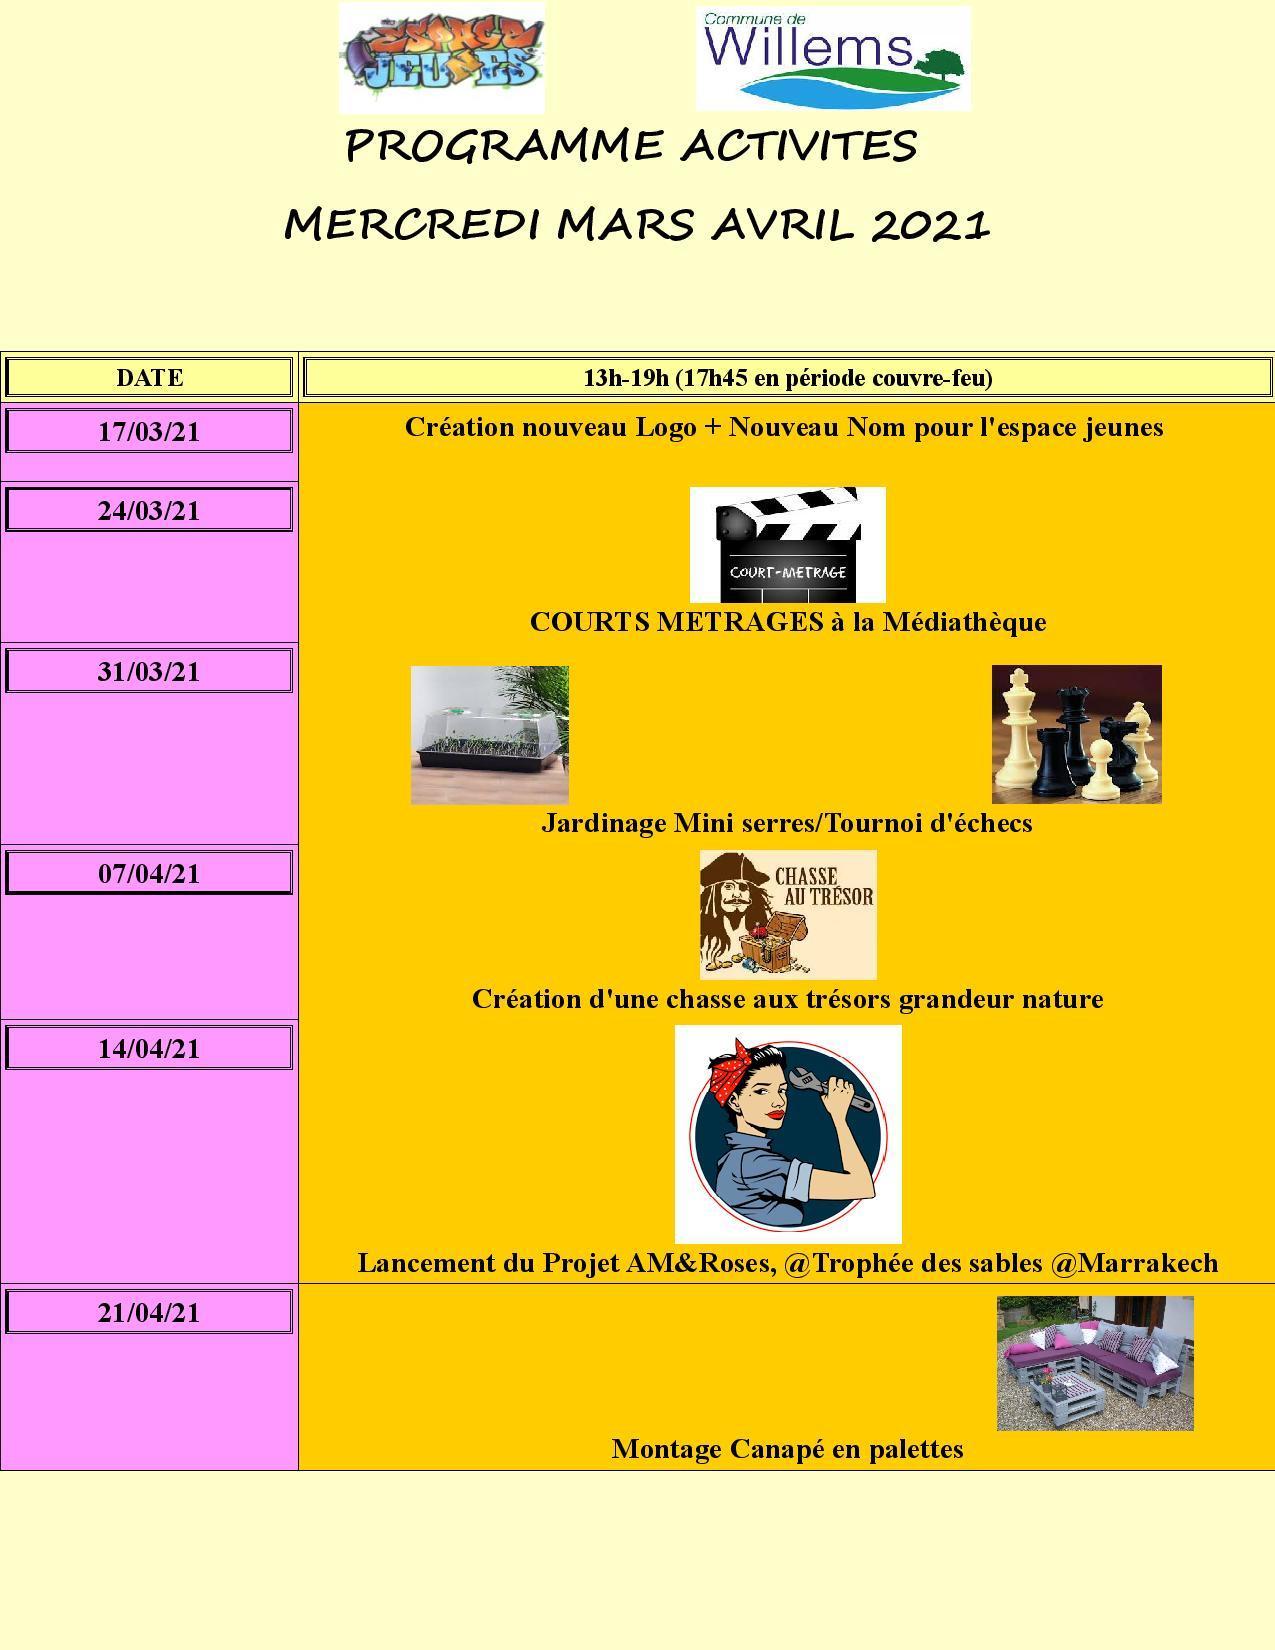 Programme mercredi mars avril 2021 page 001